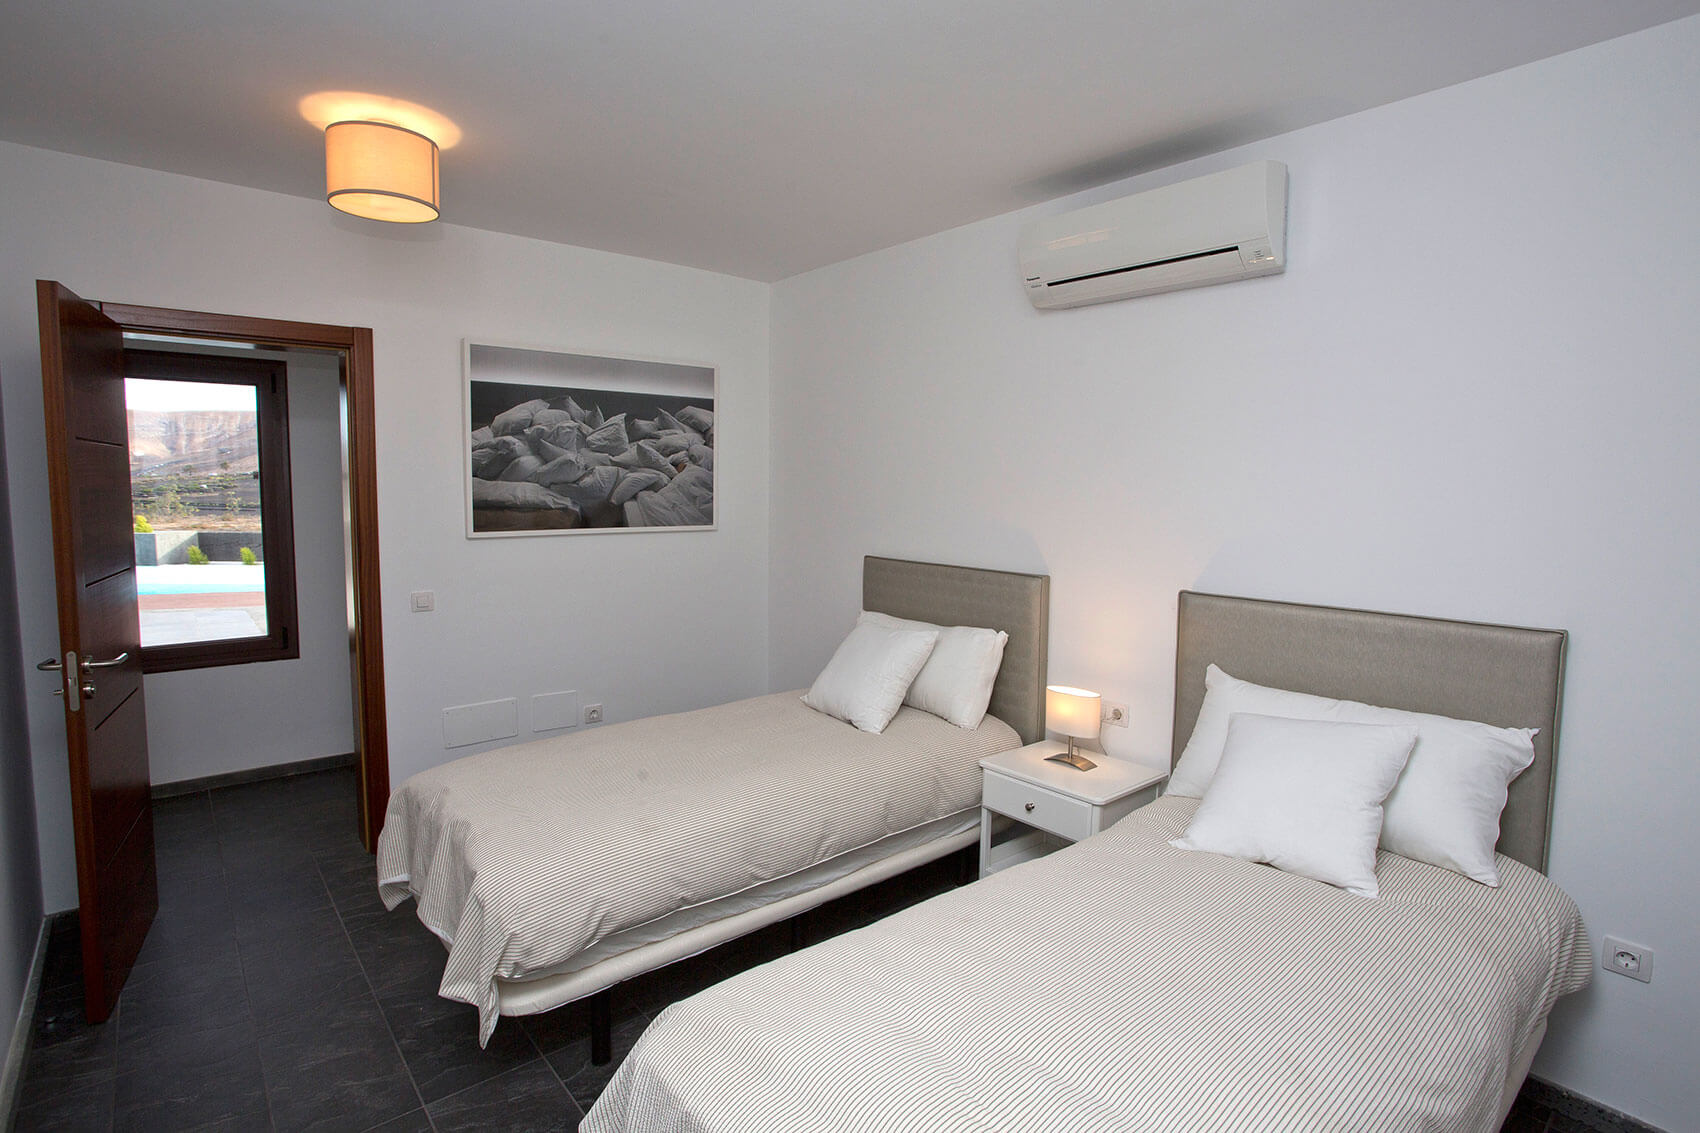 Dormitorio invitados 1 villa rayito villa rayito for Dormitorio invitados